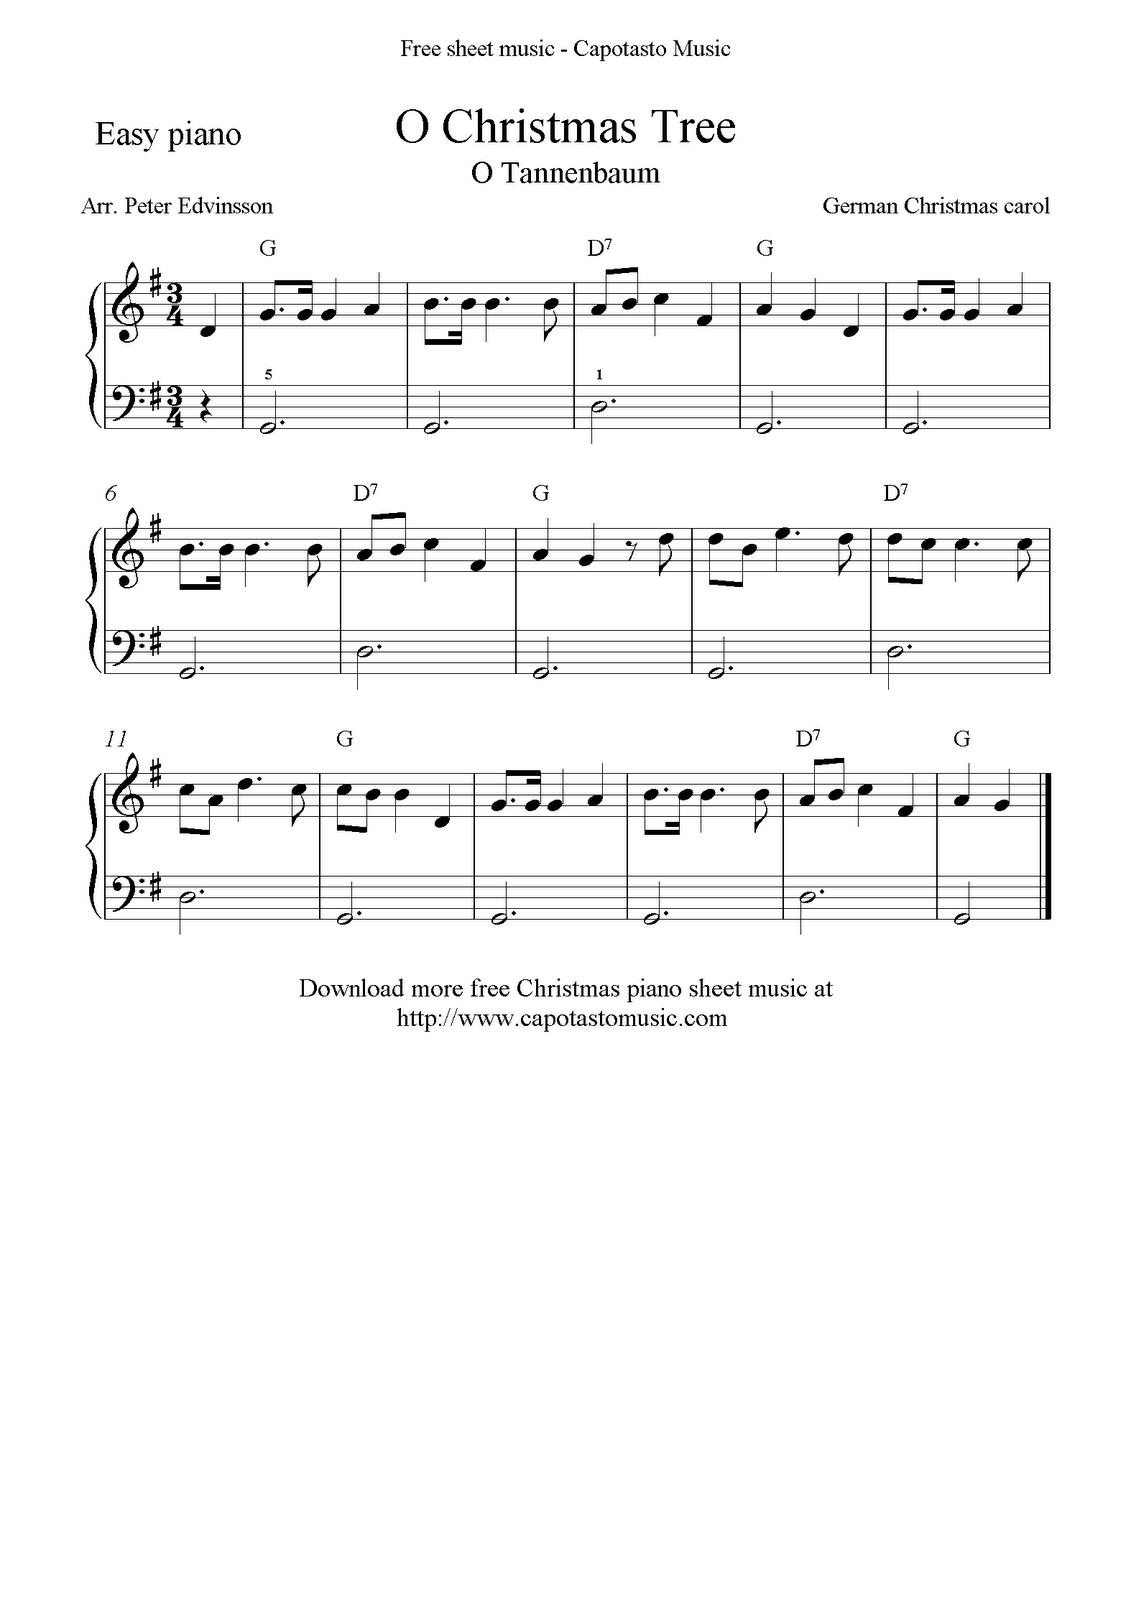 Free Sheet Music Scores Free Christmas sheet music for